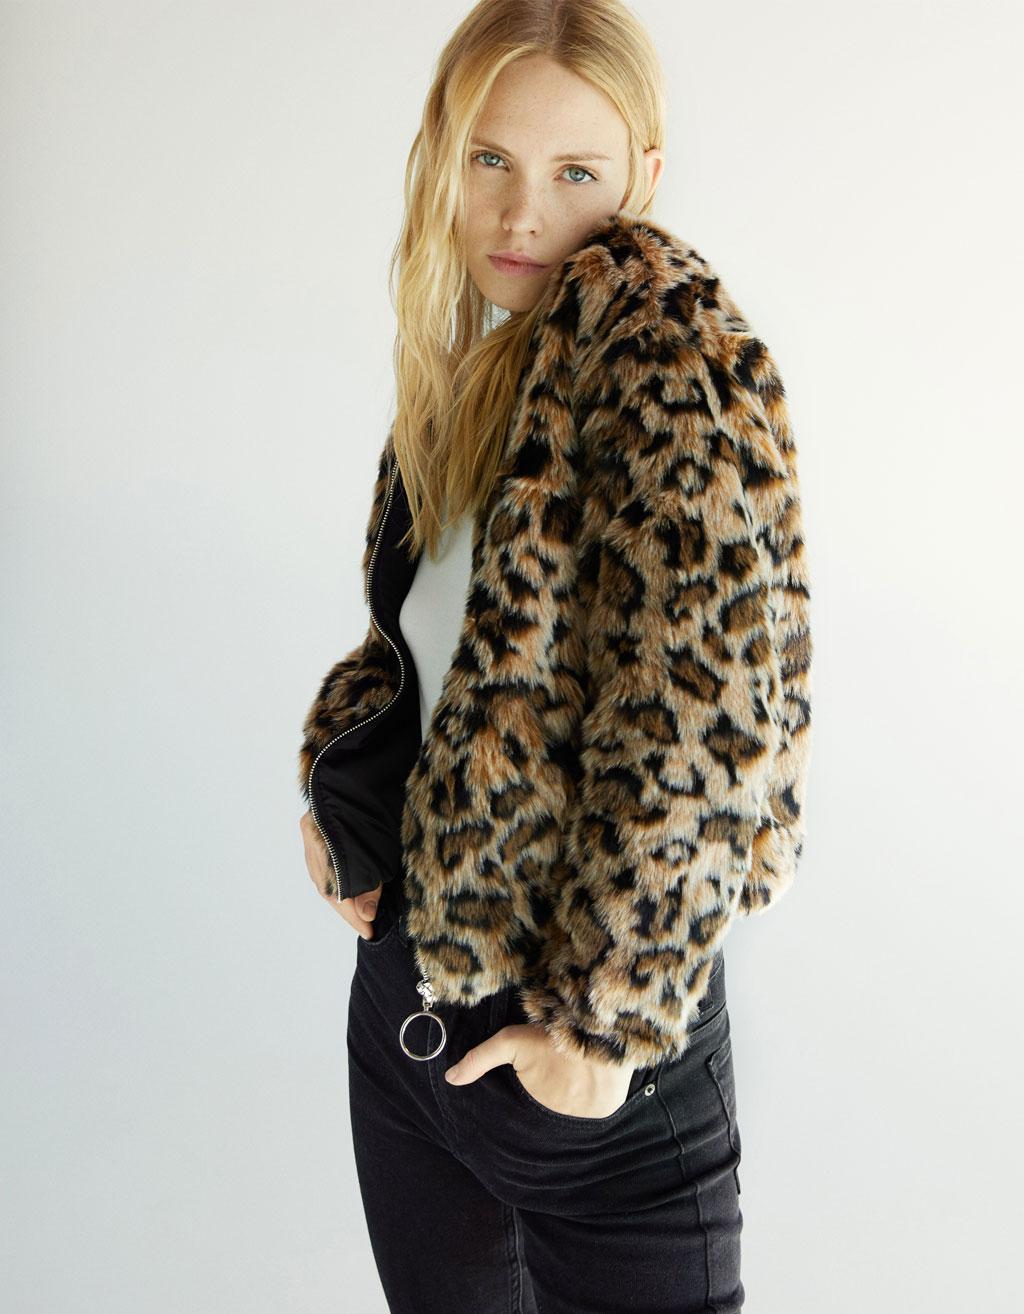 ee7deab84f76 Leopard print faux fur jacket - Coats - Bershka United Arab Emirates